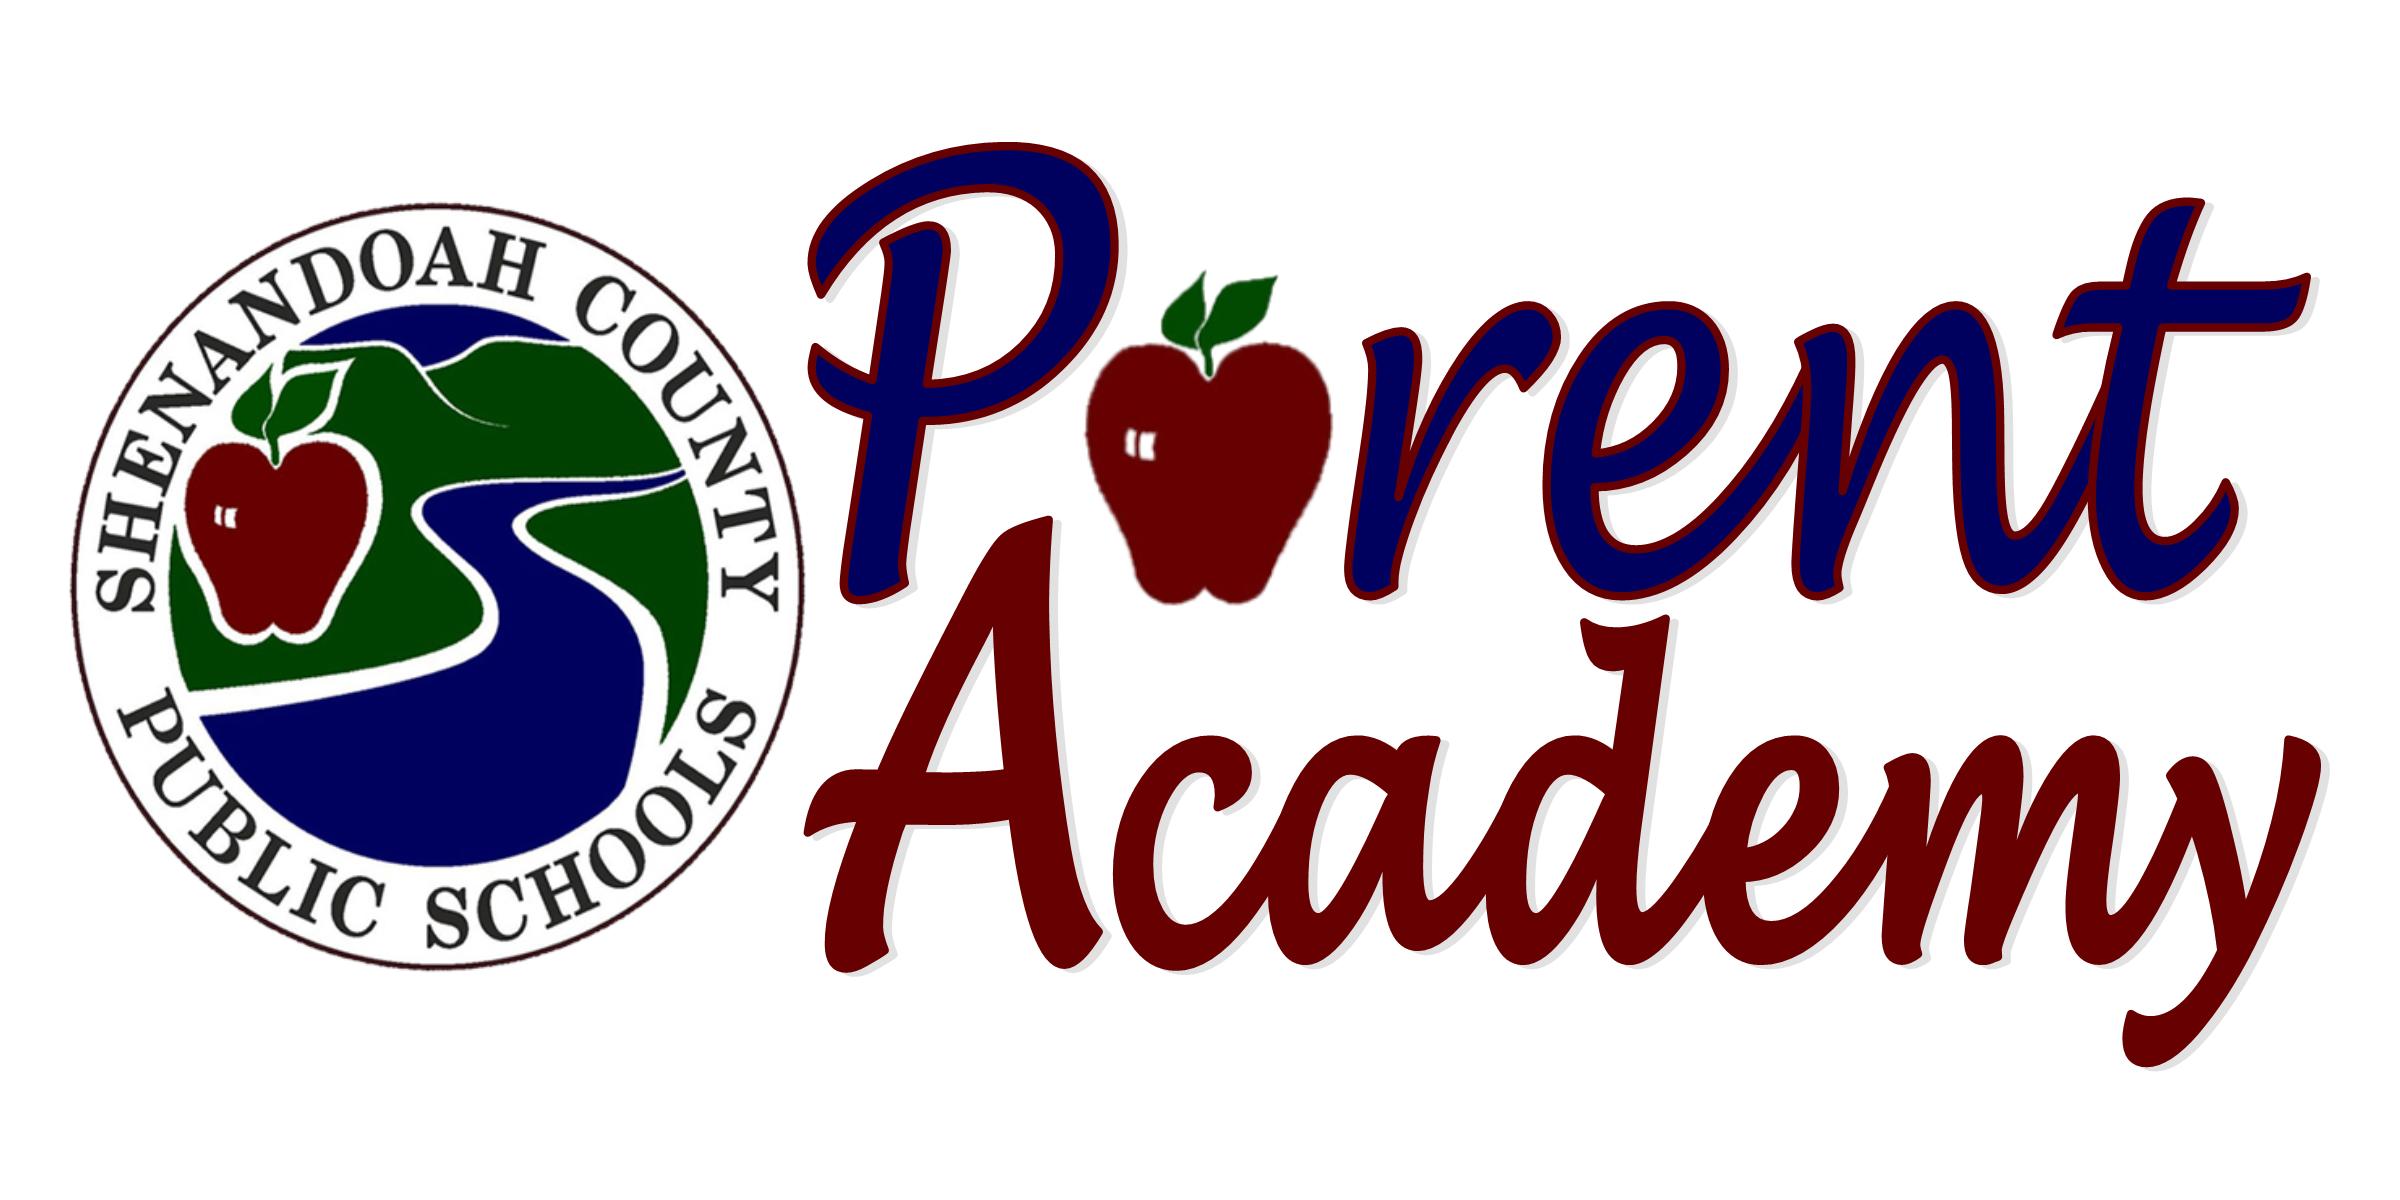 Sections - Shenandoah County Public Schools Intended For Shenandoah County Public Schools Calendar